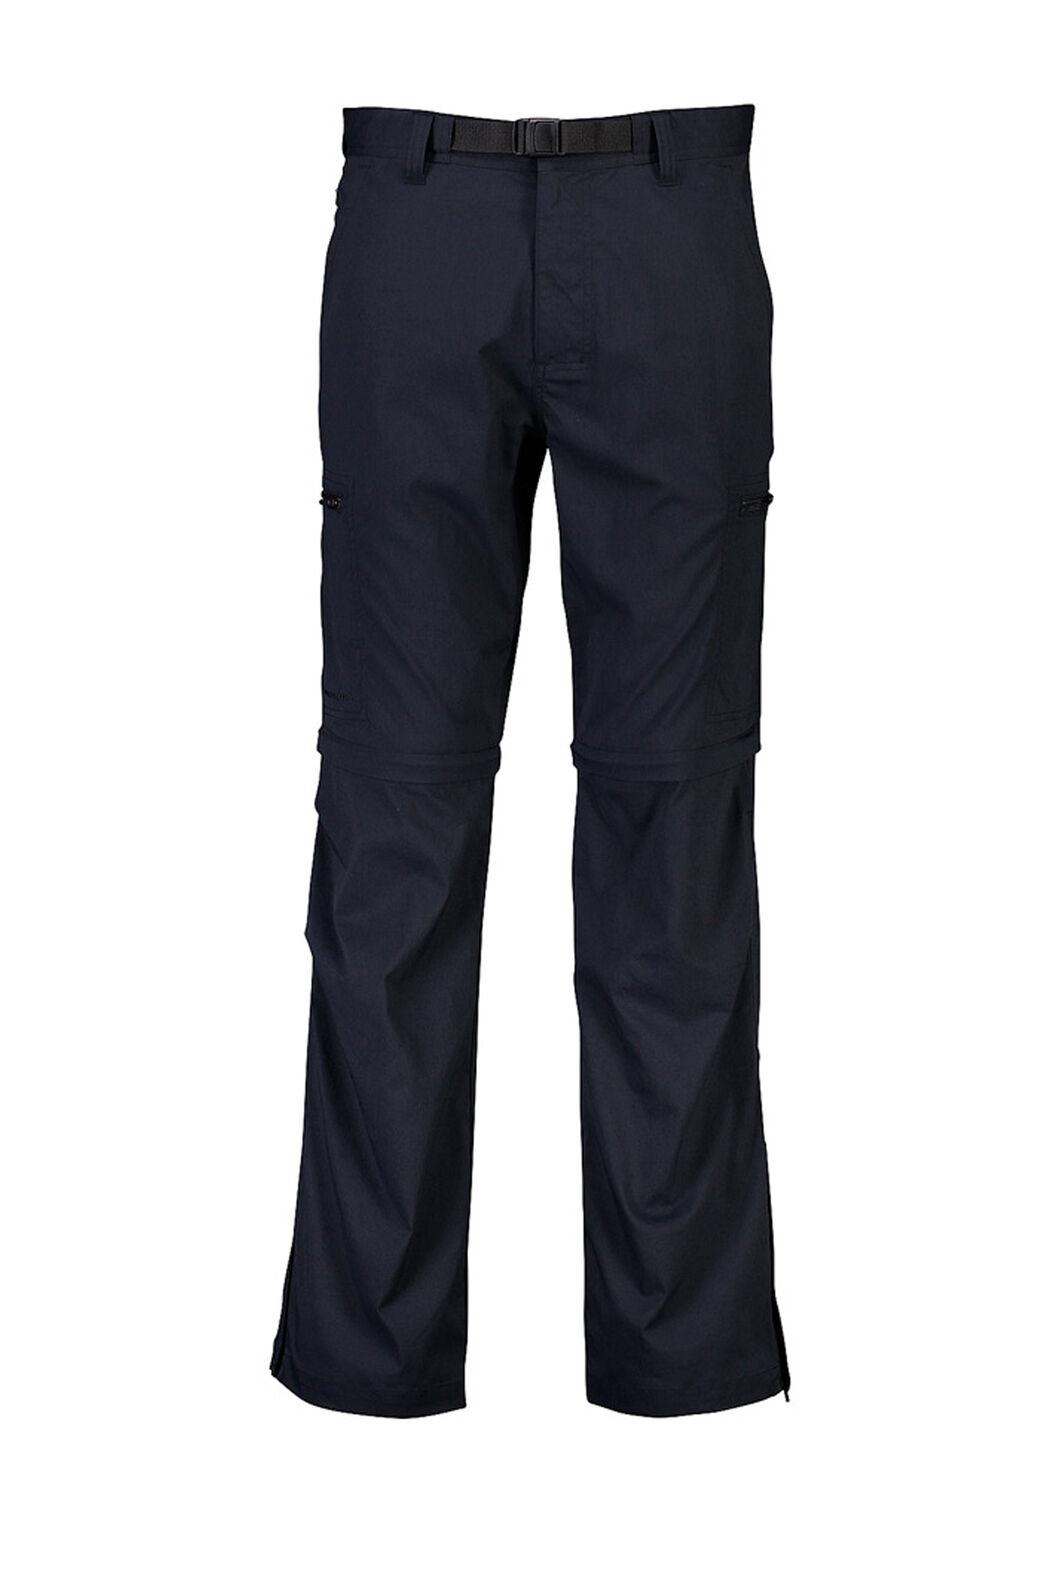 Macpac Rockover Convertible Pants — Women's, Black, hi-res